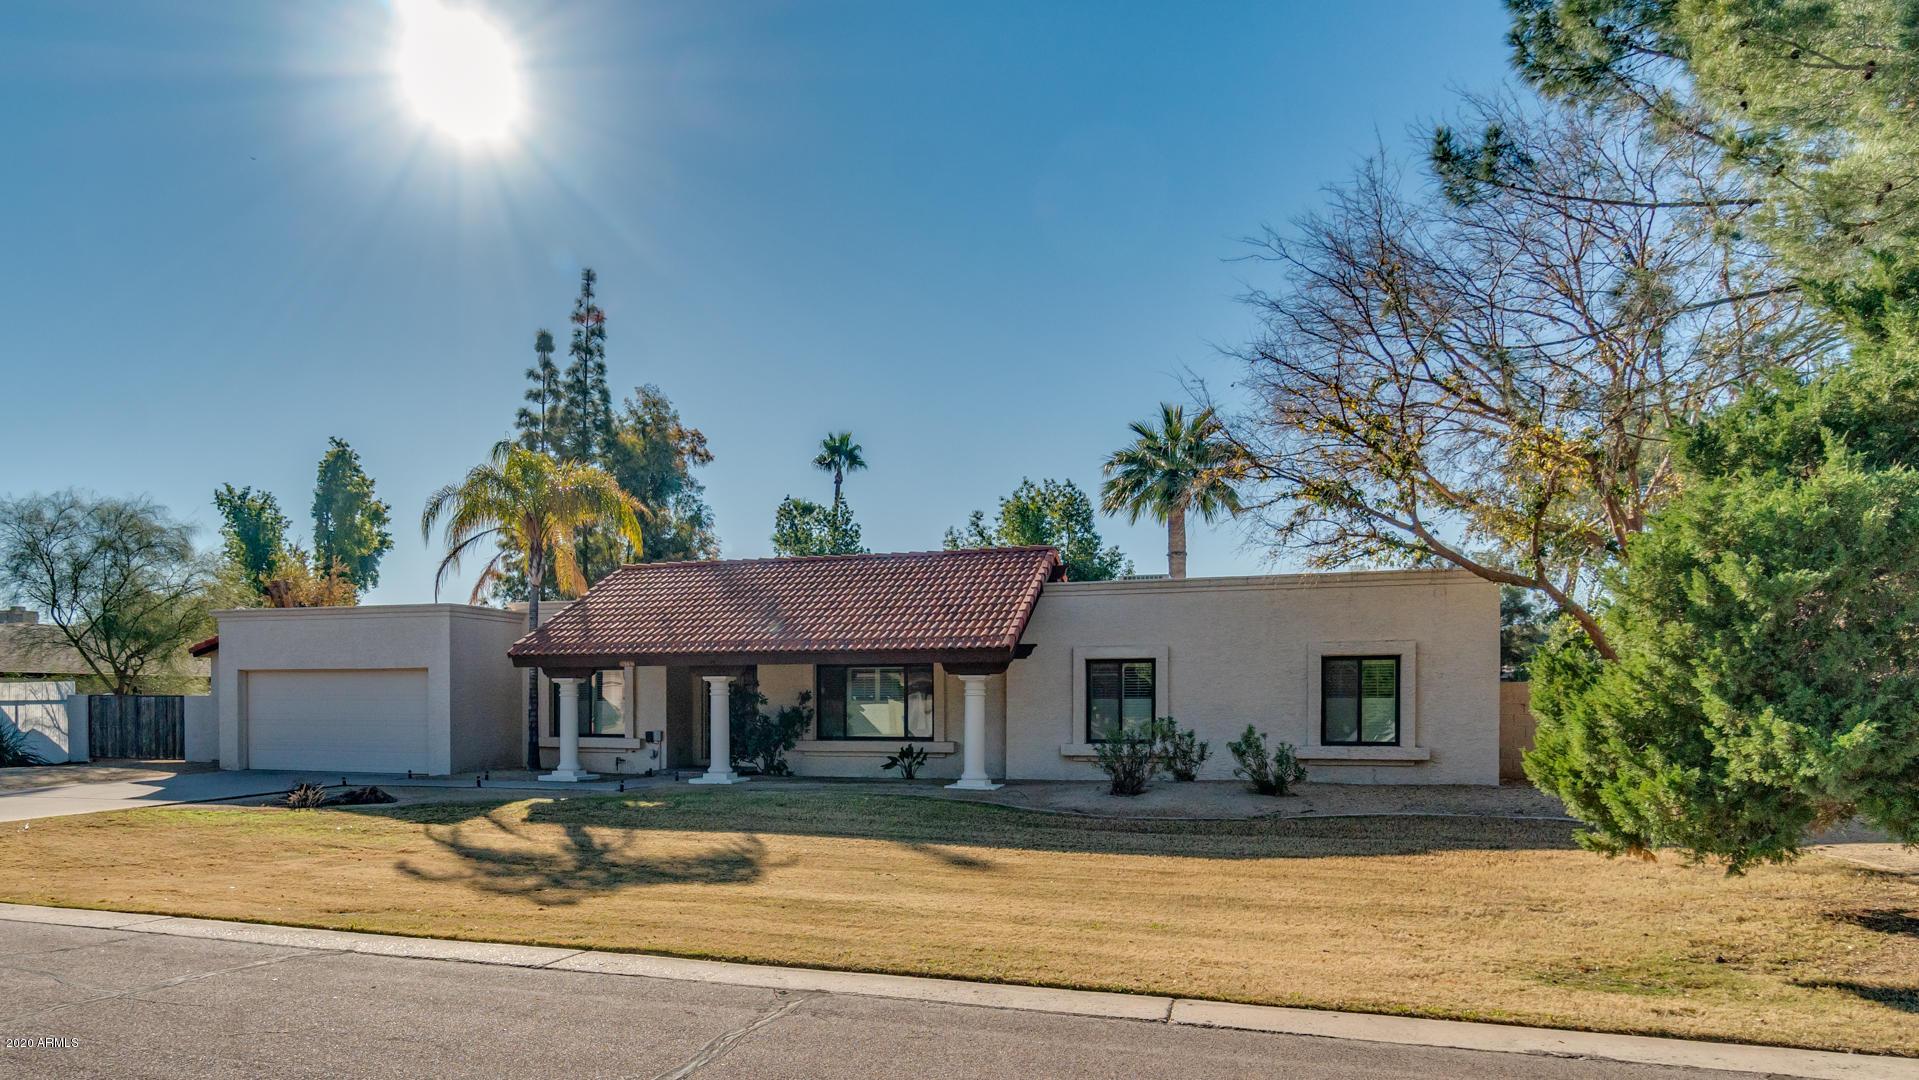 Photo of 15 W VINEDO Lane, Tempe, AZ 85284